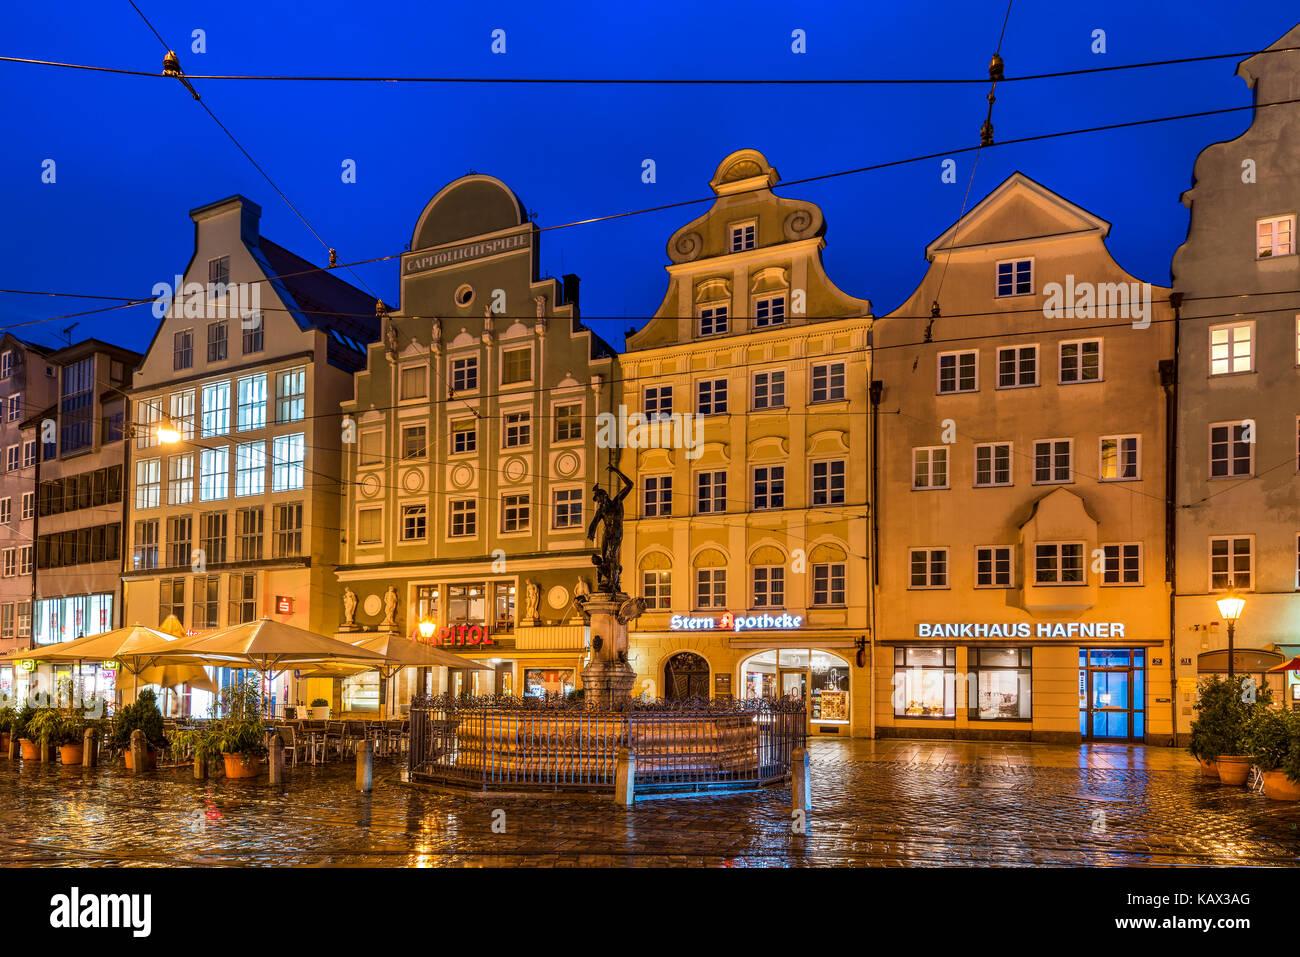 Night view of Maximilianstrasse, Augsburg, Bavaria, Germany - Stock Image